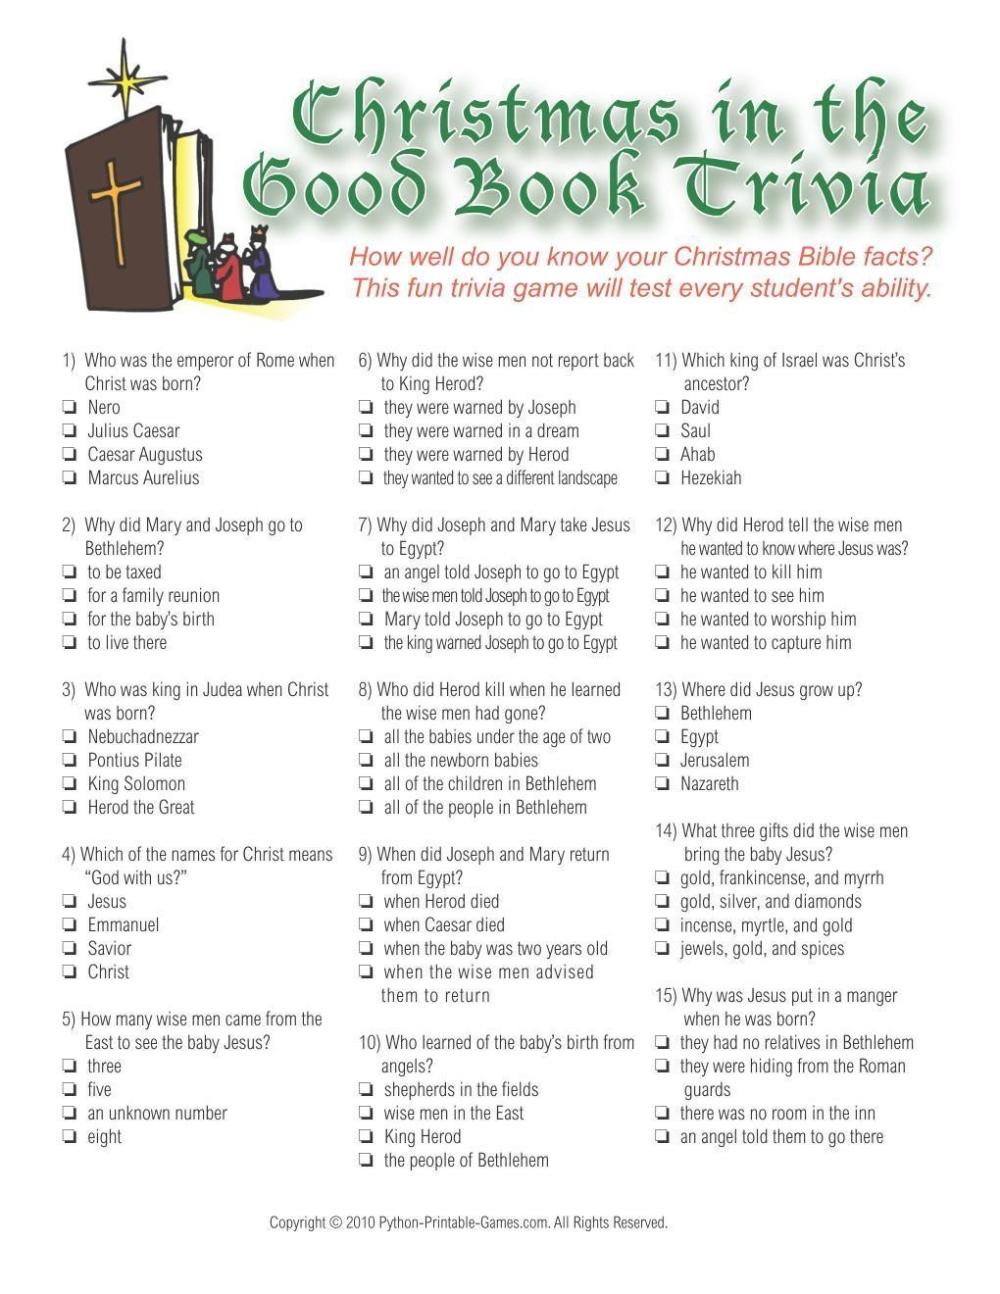 Christmas Trivia Quiz For Schools 2020 Christmas: Christmas Bible Trivia Game in 2020   Christmas trivia